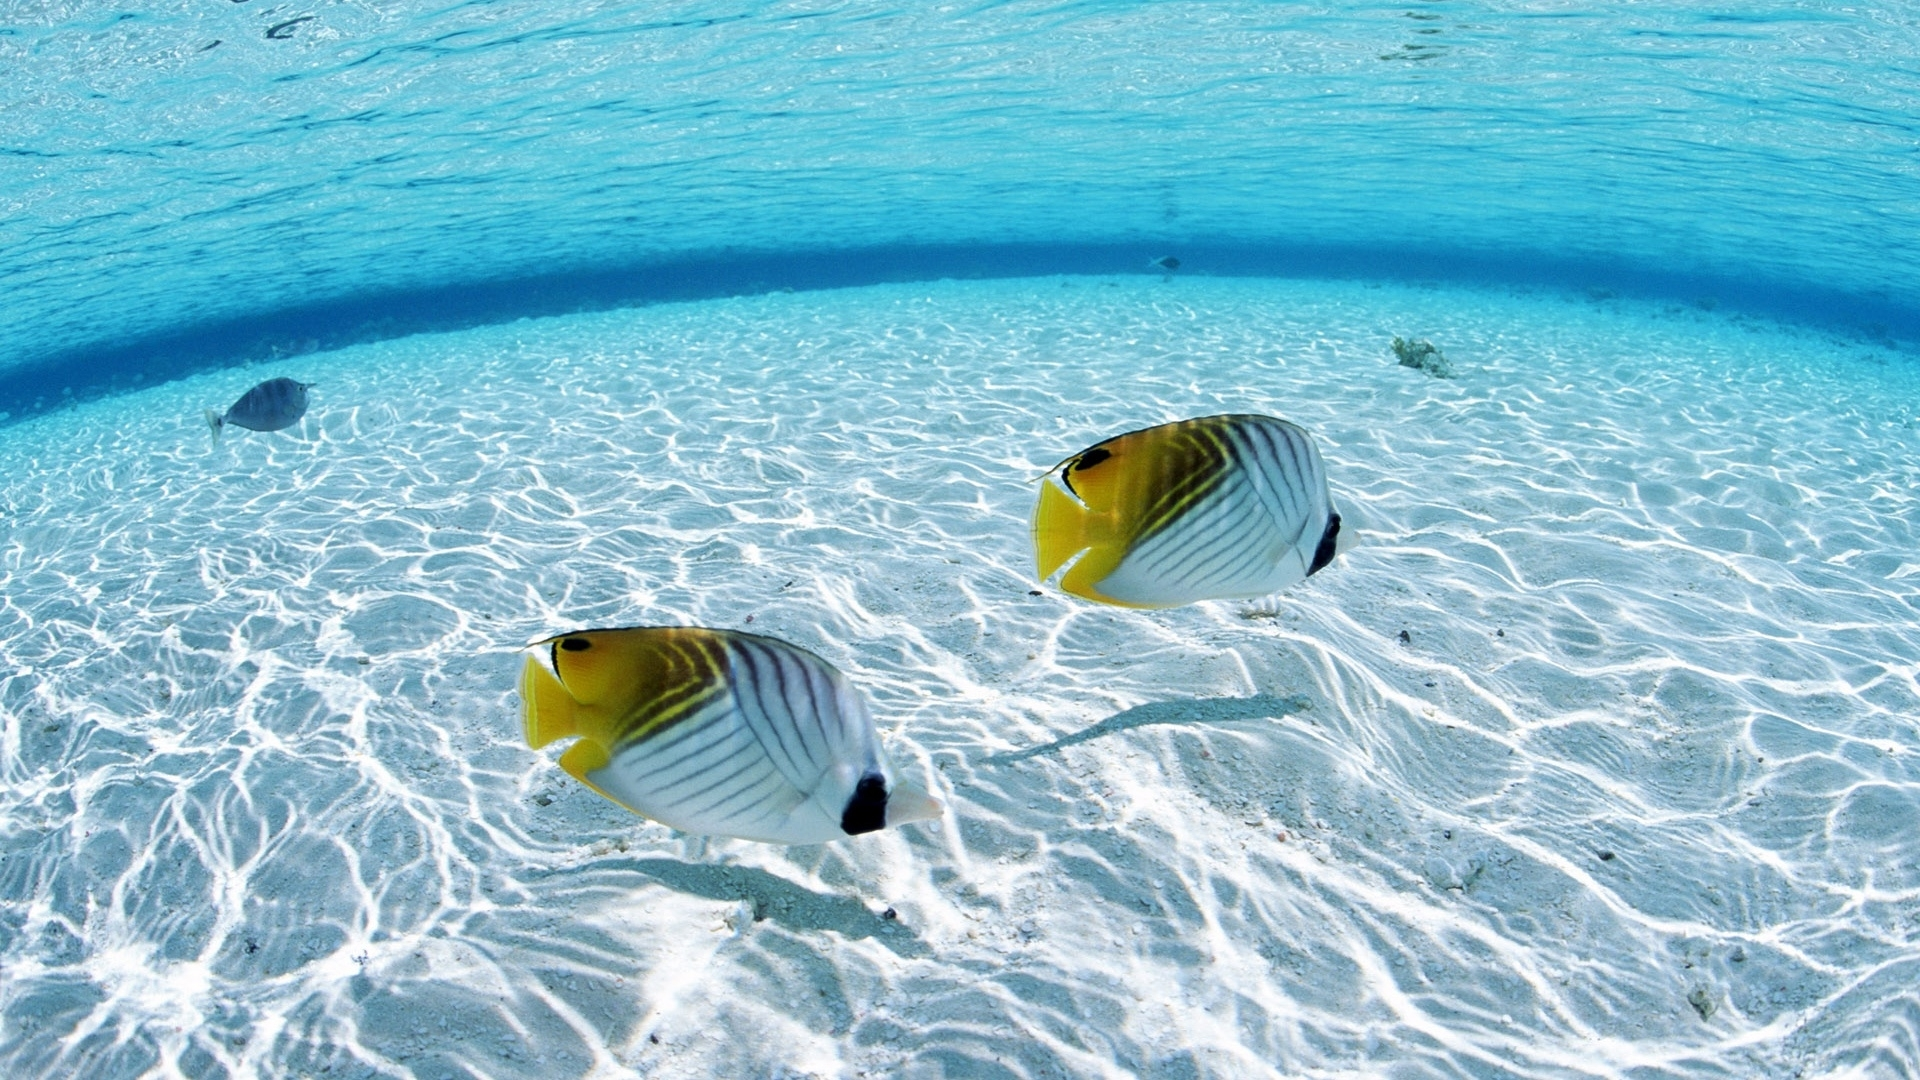 tropical fish wallpaper hd download best tropical fish wallpaper